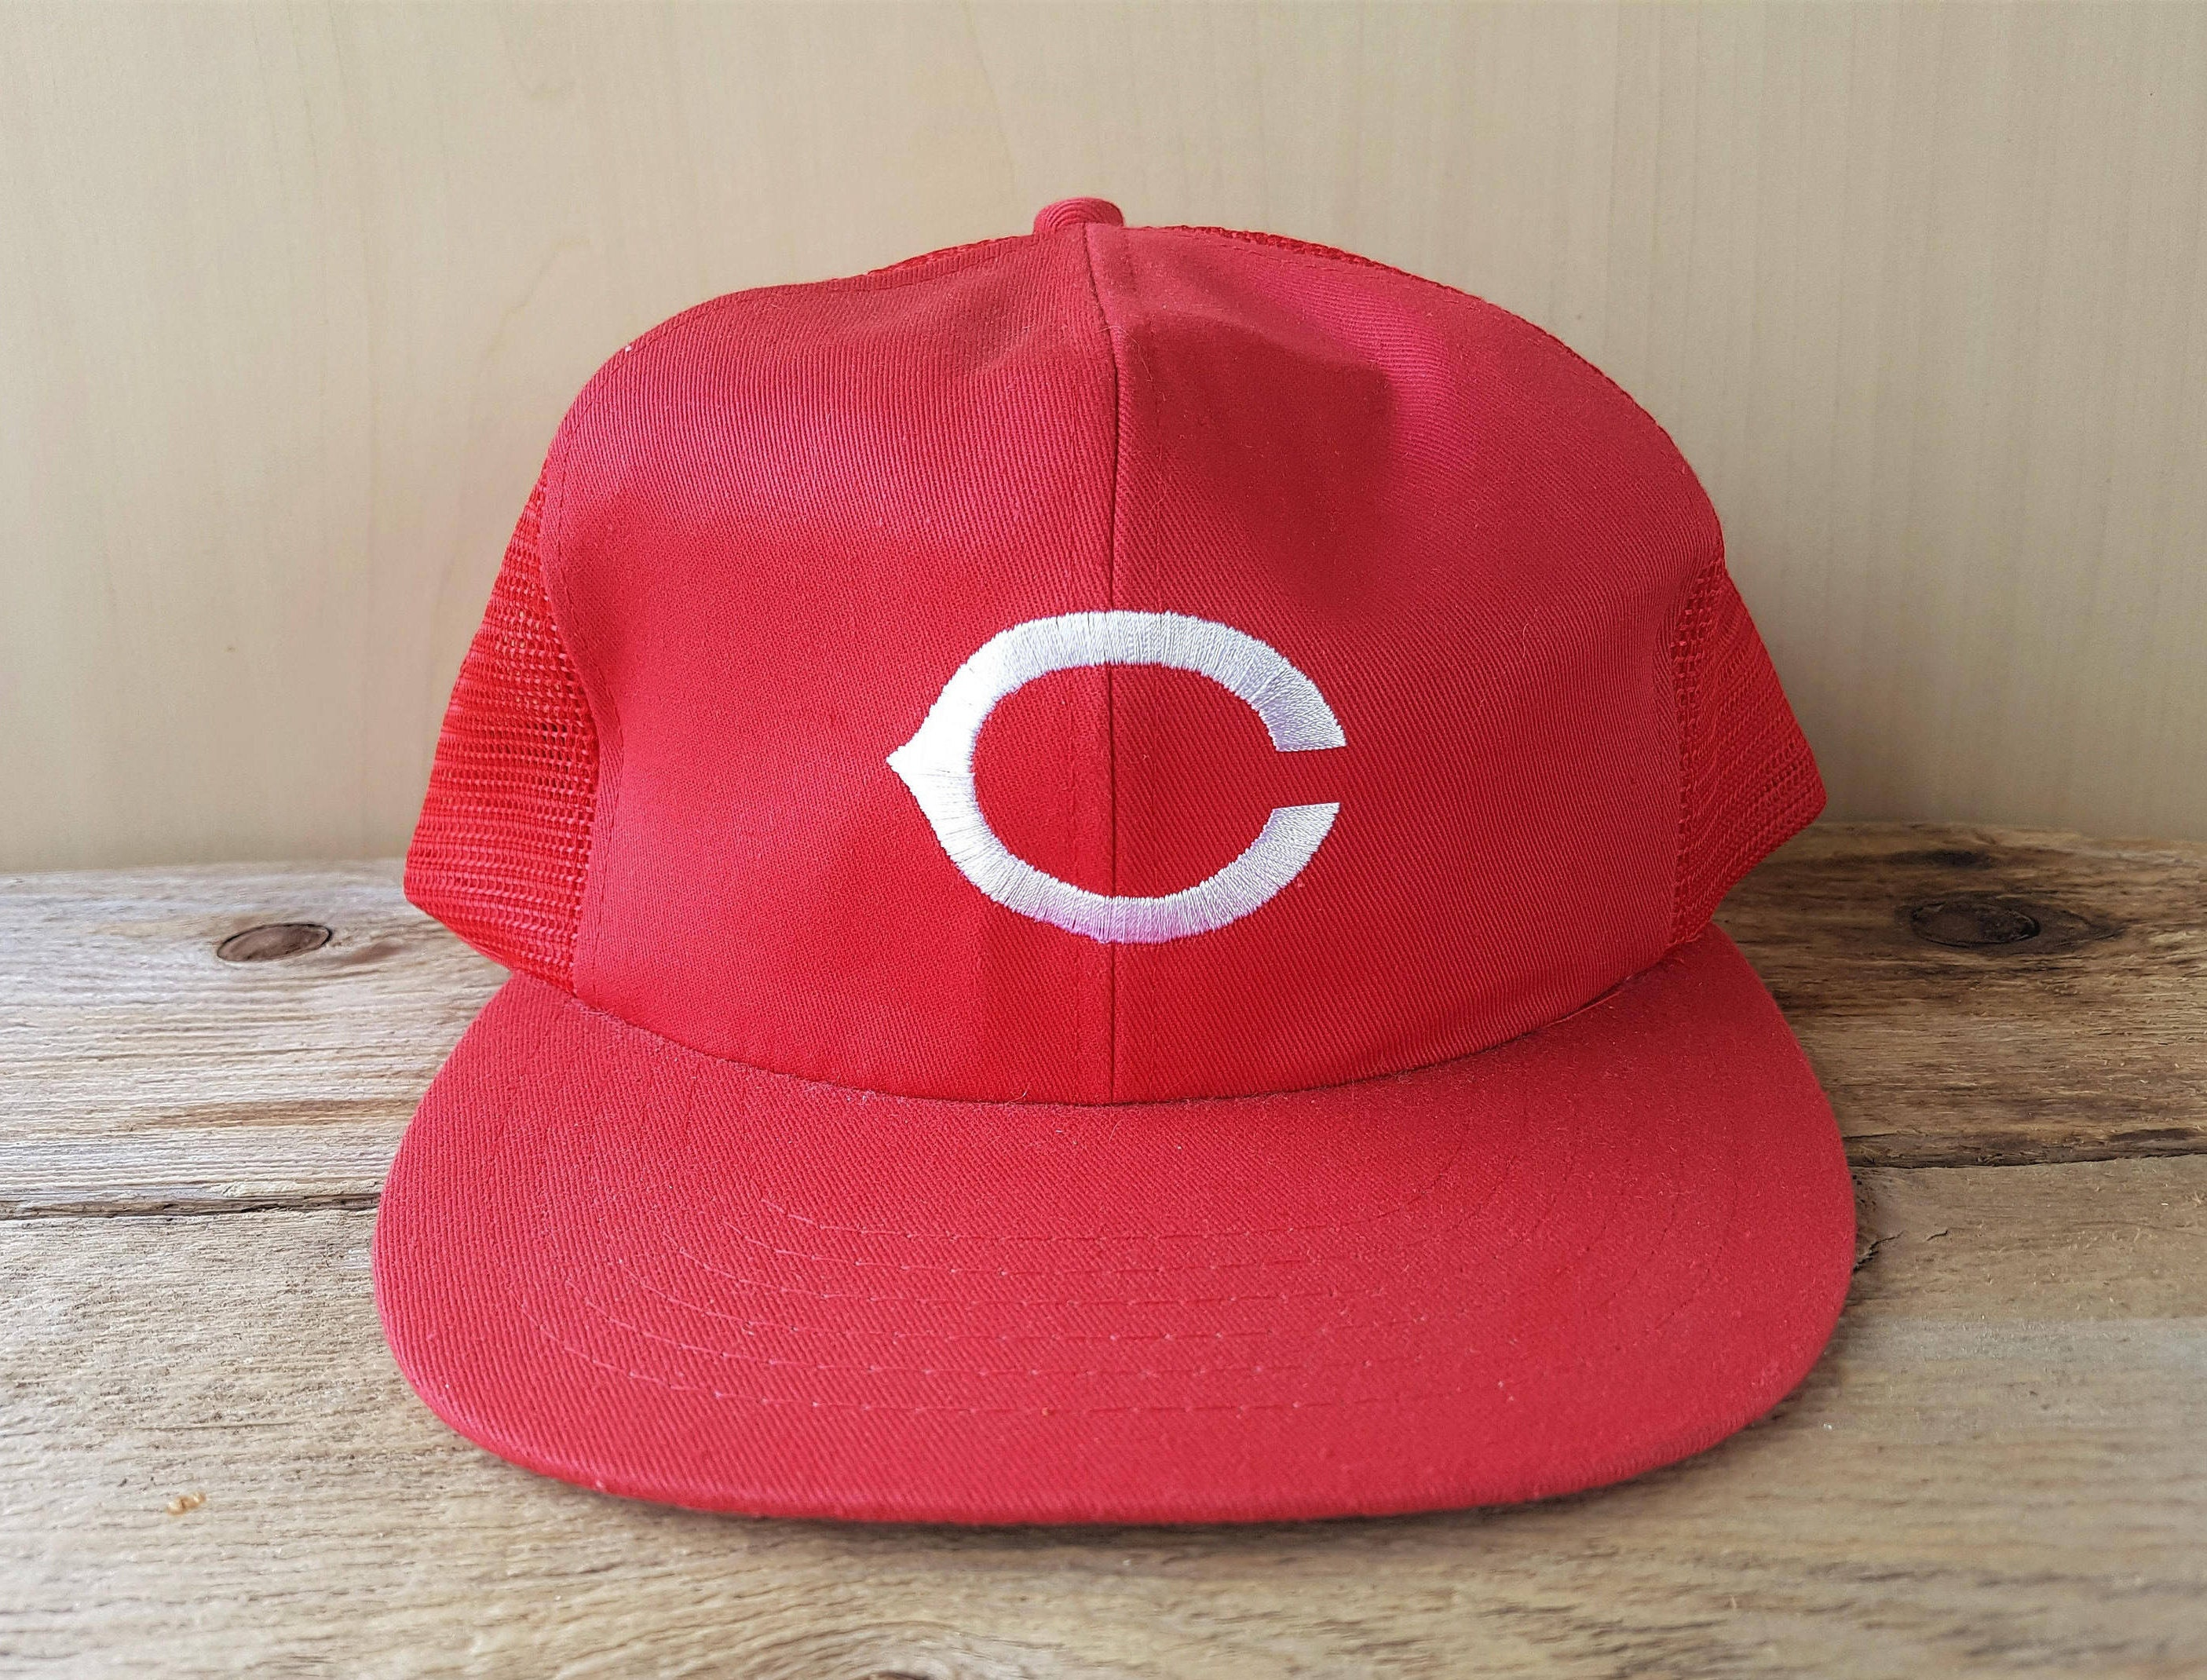 602955fd2 CINCINNATI REDS Original Vintage 80s Official Licensed MLB Red Mesh Cap  Trucker Snapback Hat Major League Baseball Annco Throwback Ballcap